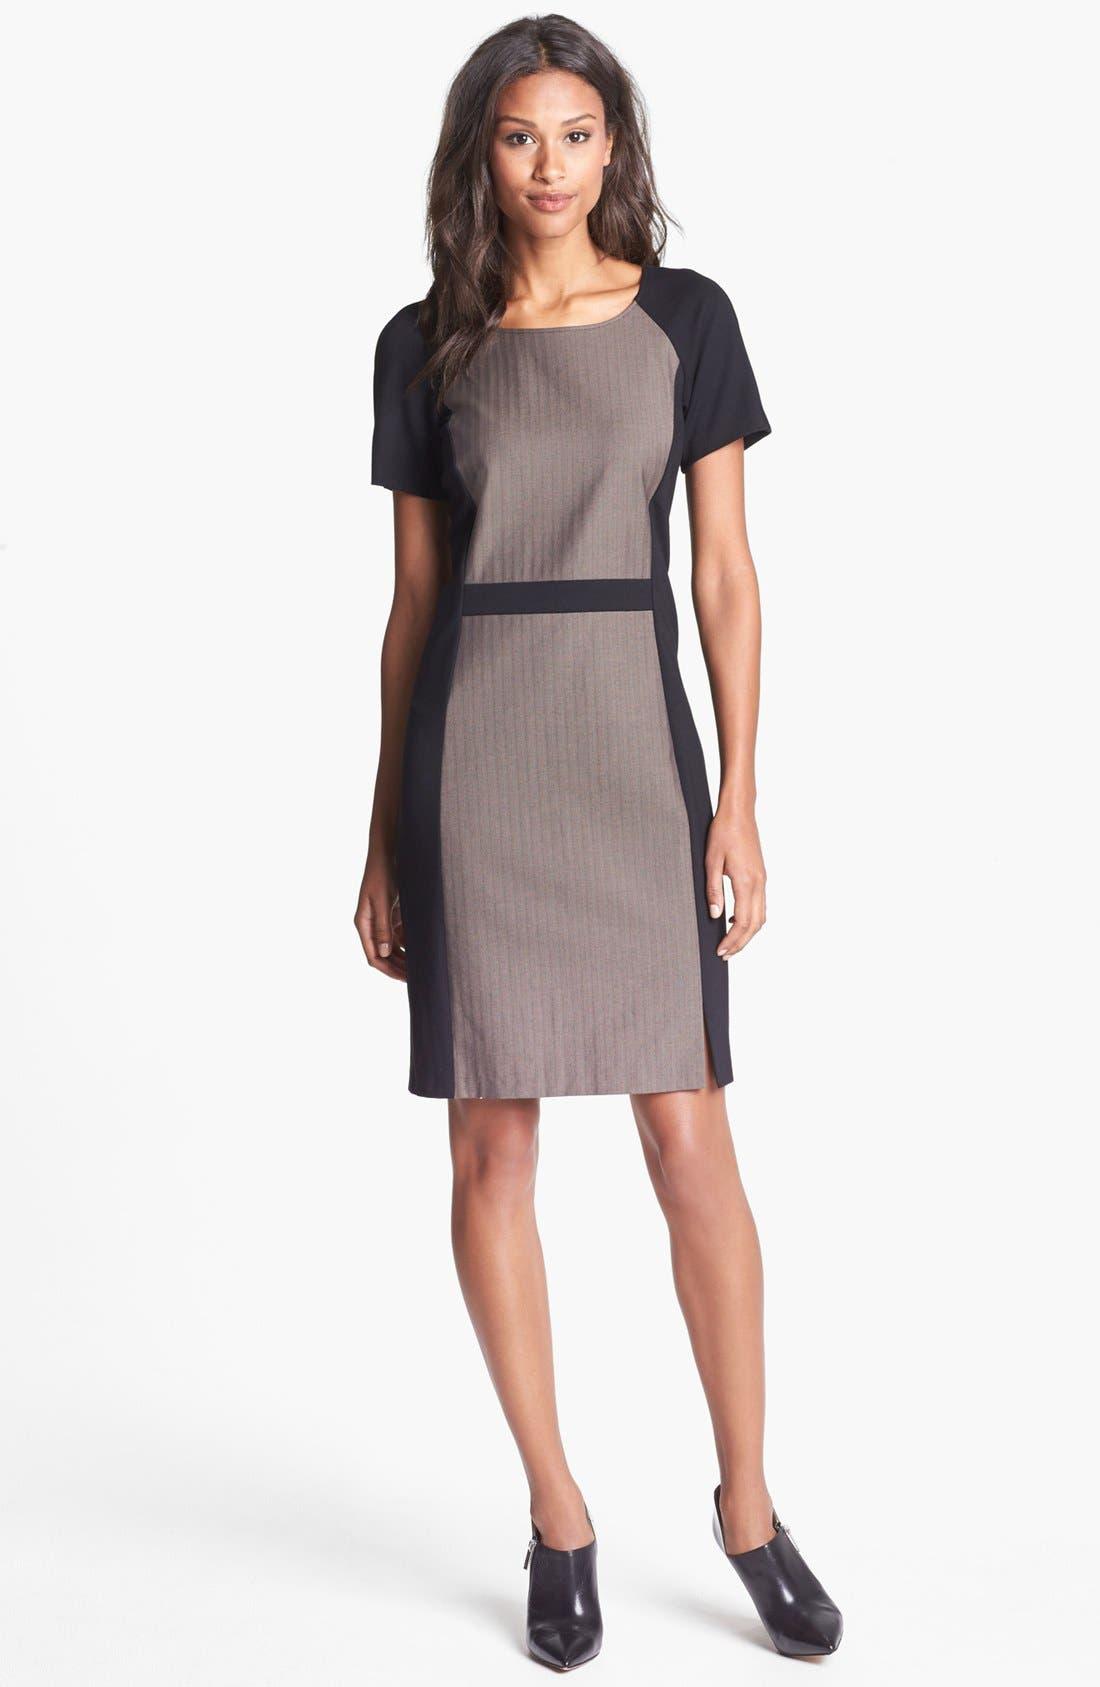 Alternate Image 1 Selected - DKNYC Ponte Inset Herringbone Sheath Dress